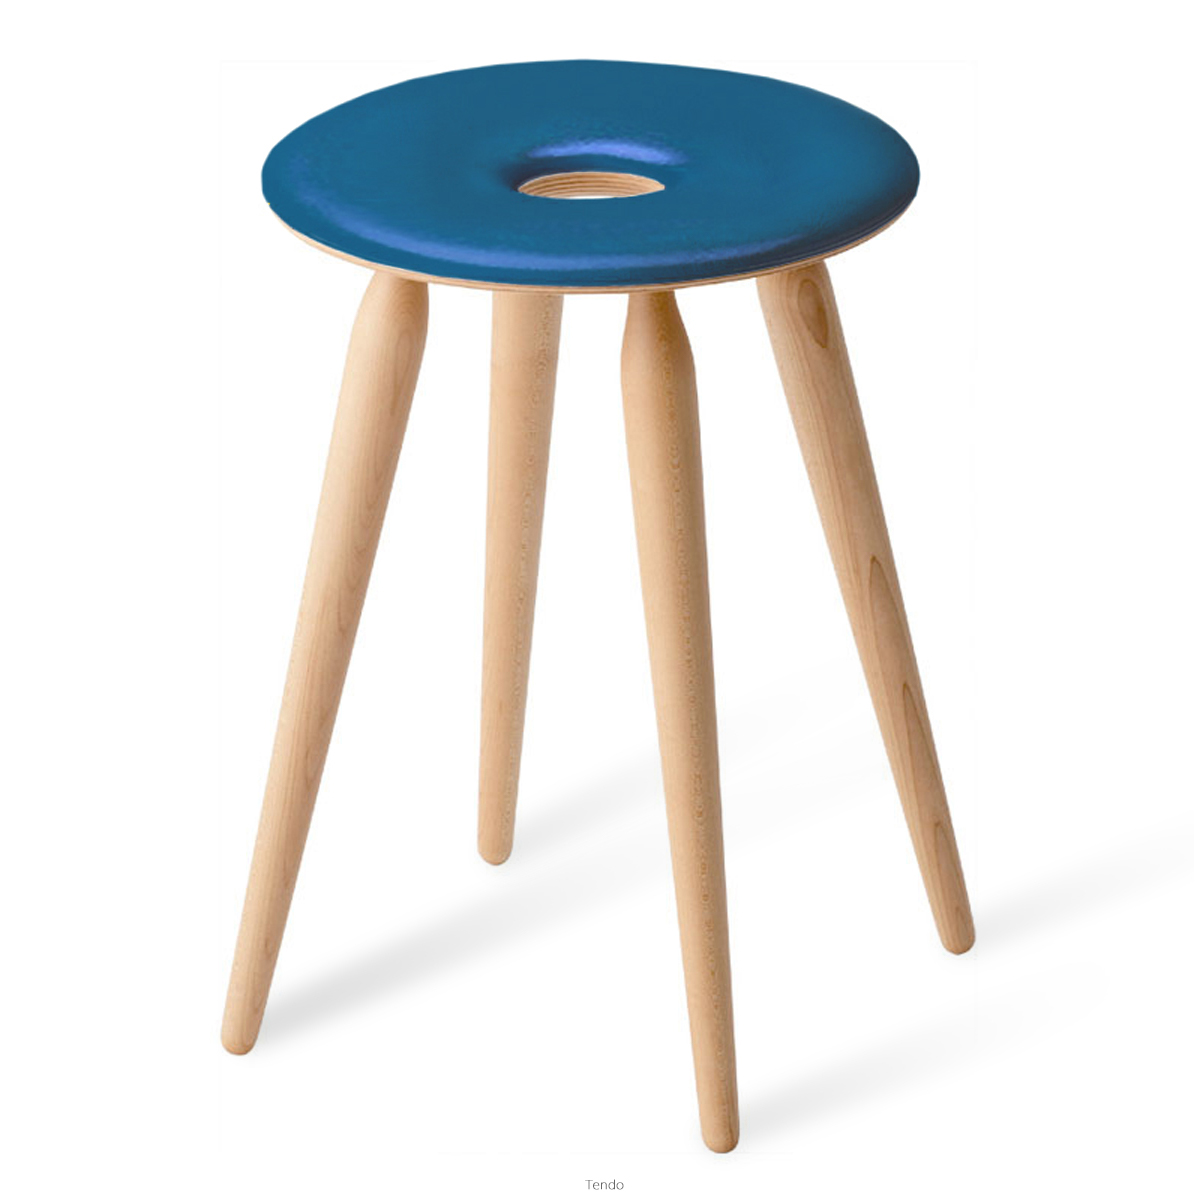 Tendo(天童木工) リングスツール (ブルーV0155) [品番:S-3165MP-NT_V0155]【全国送料無料】【同梱不可】【店頭受取対応商品】